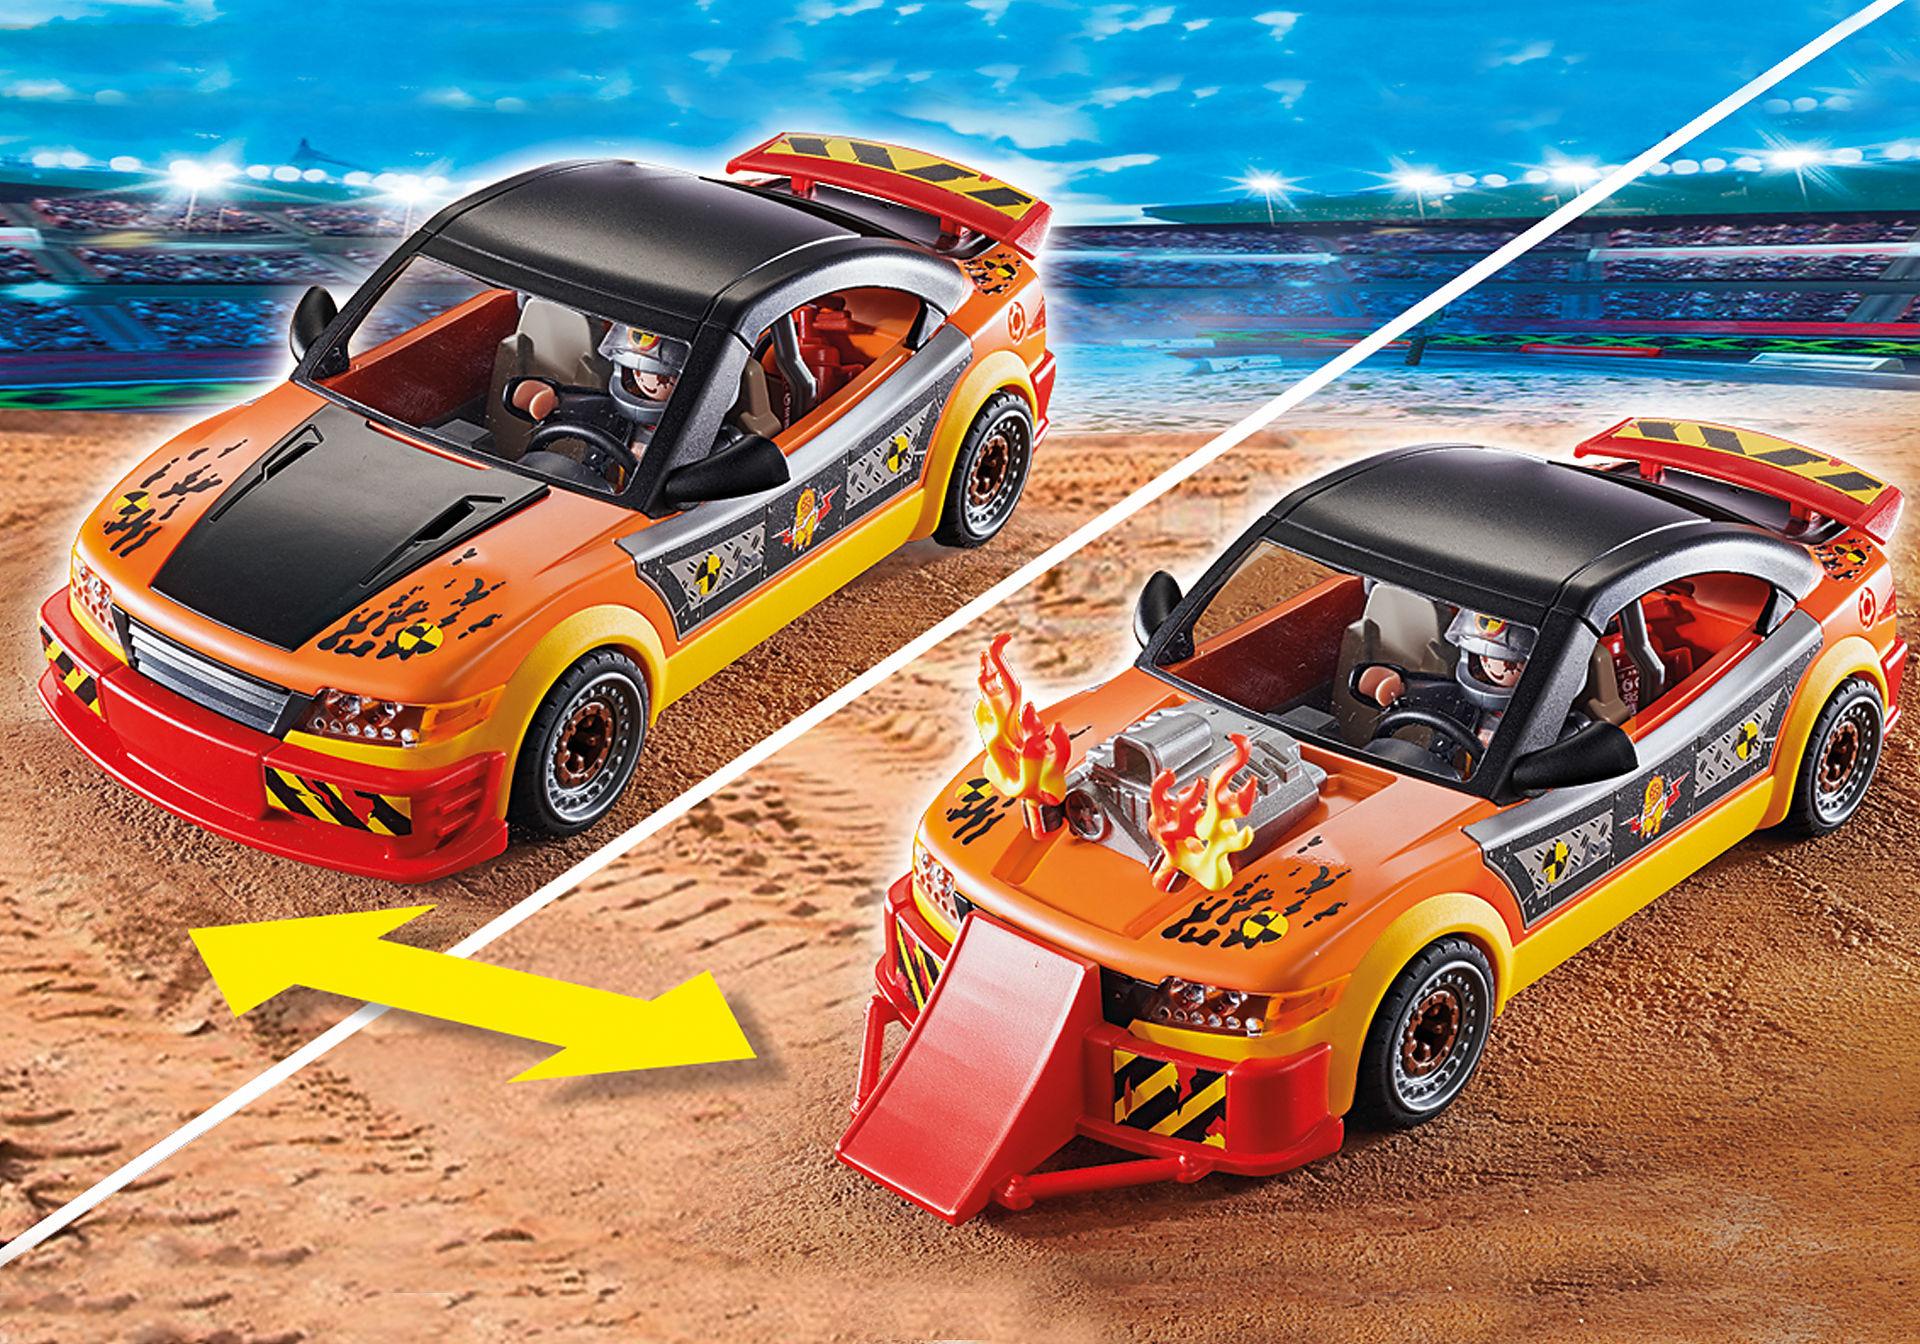 70551 Stunt Show Crash Car zoom image5